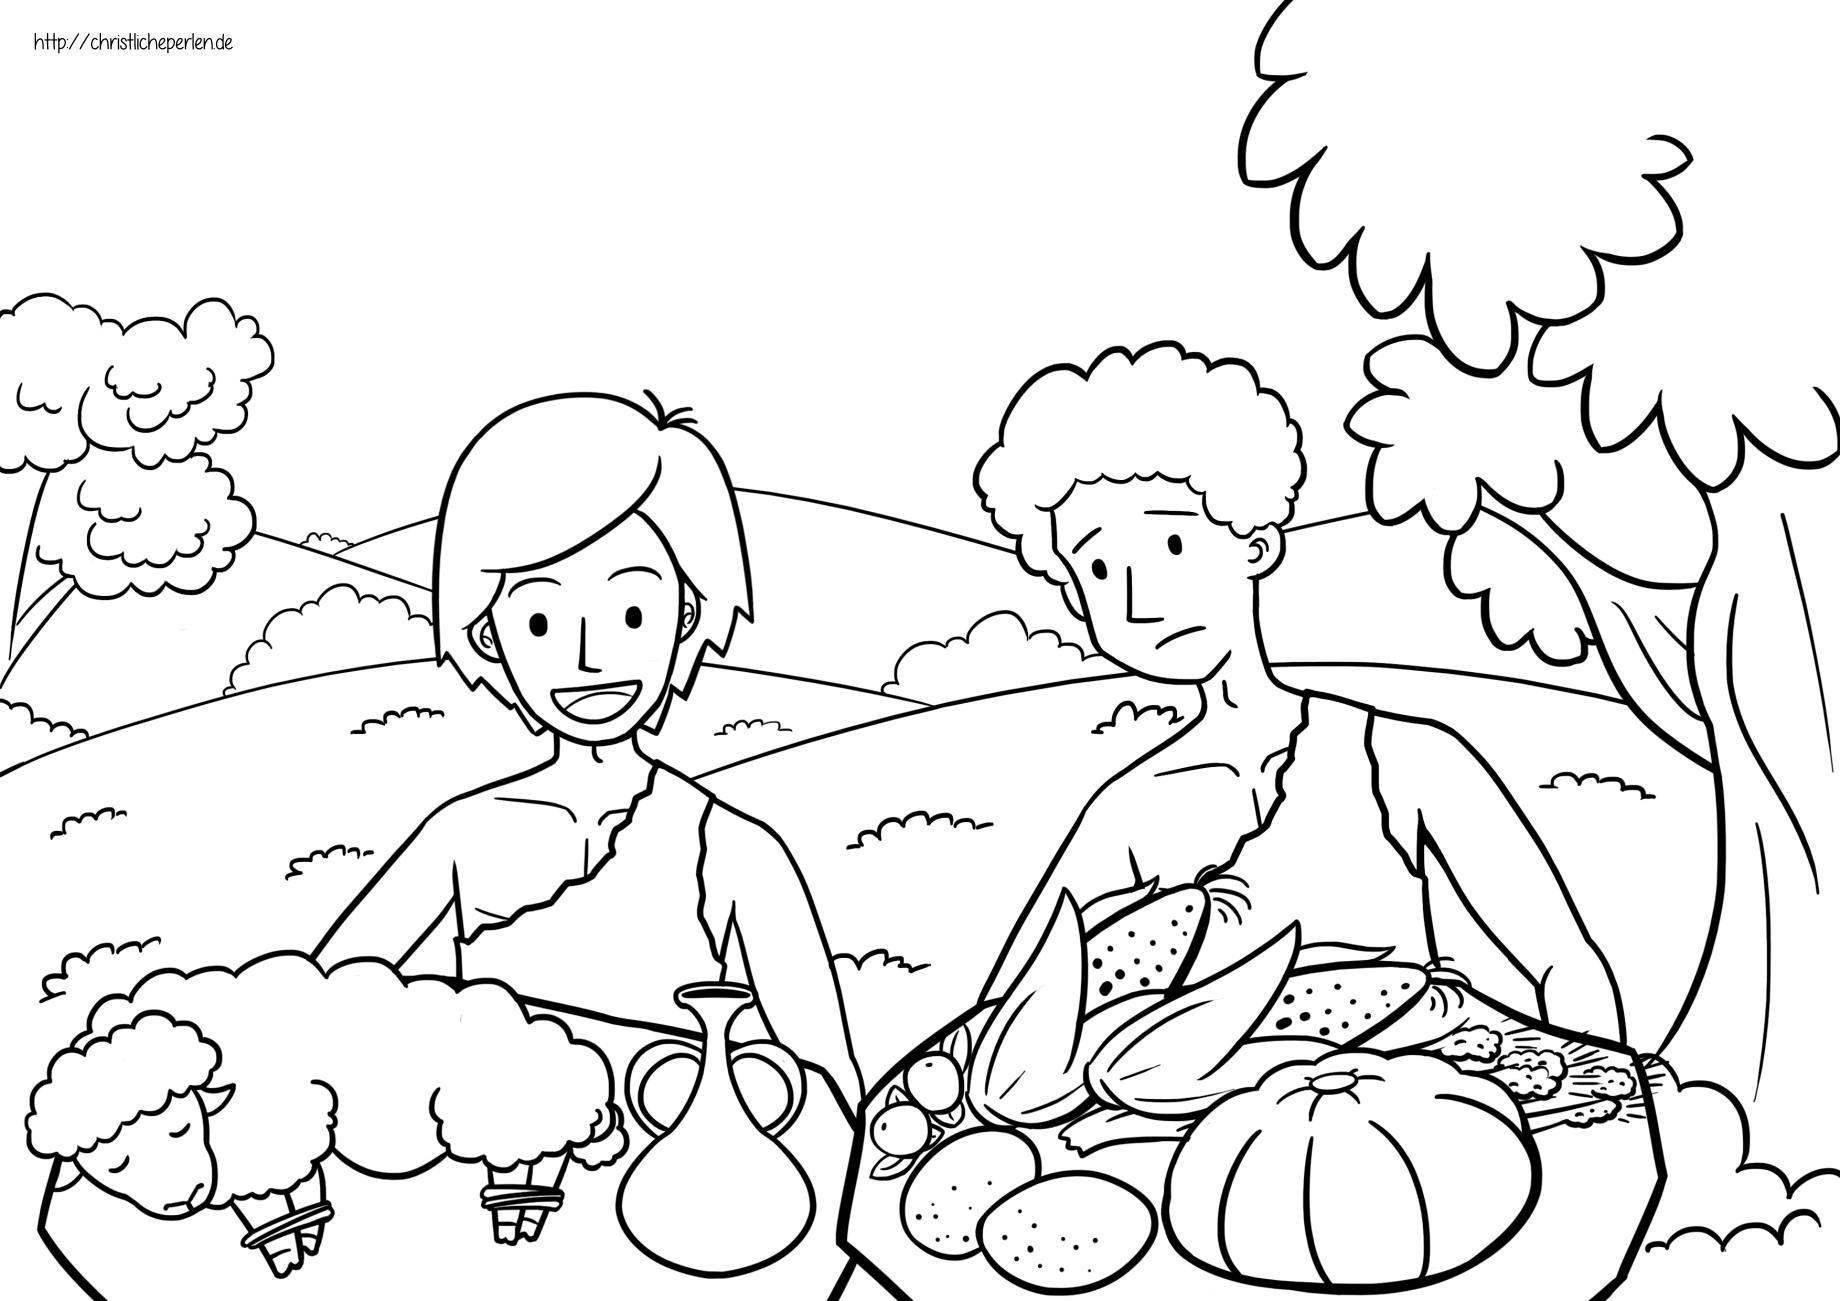 Kain und Abel ausmalen / Cain and Abel Coloring Pages | Christliche ...